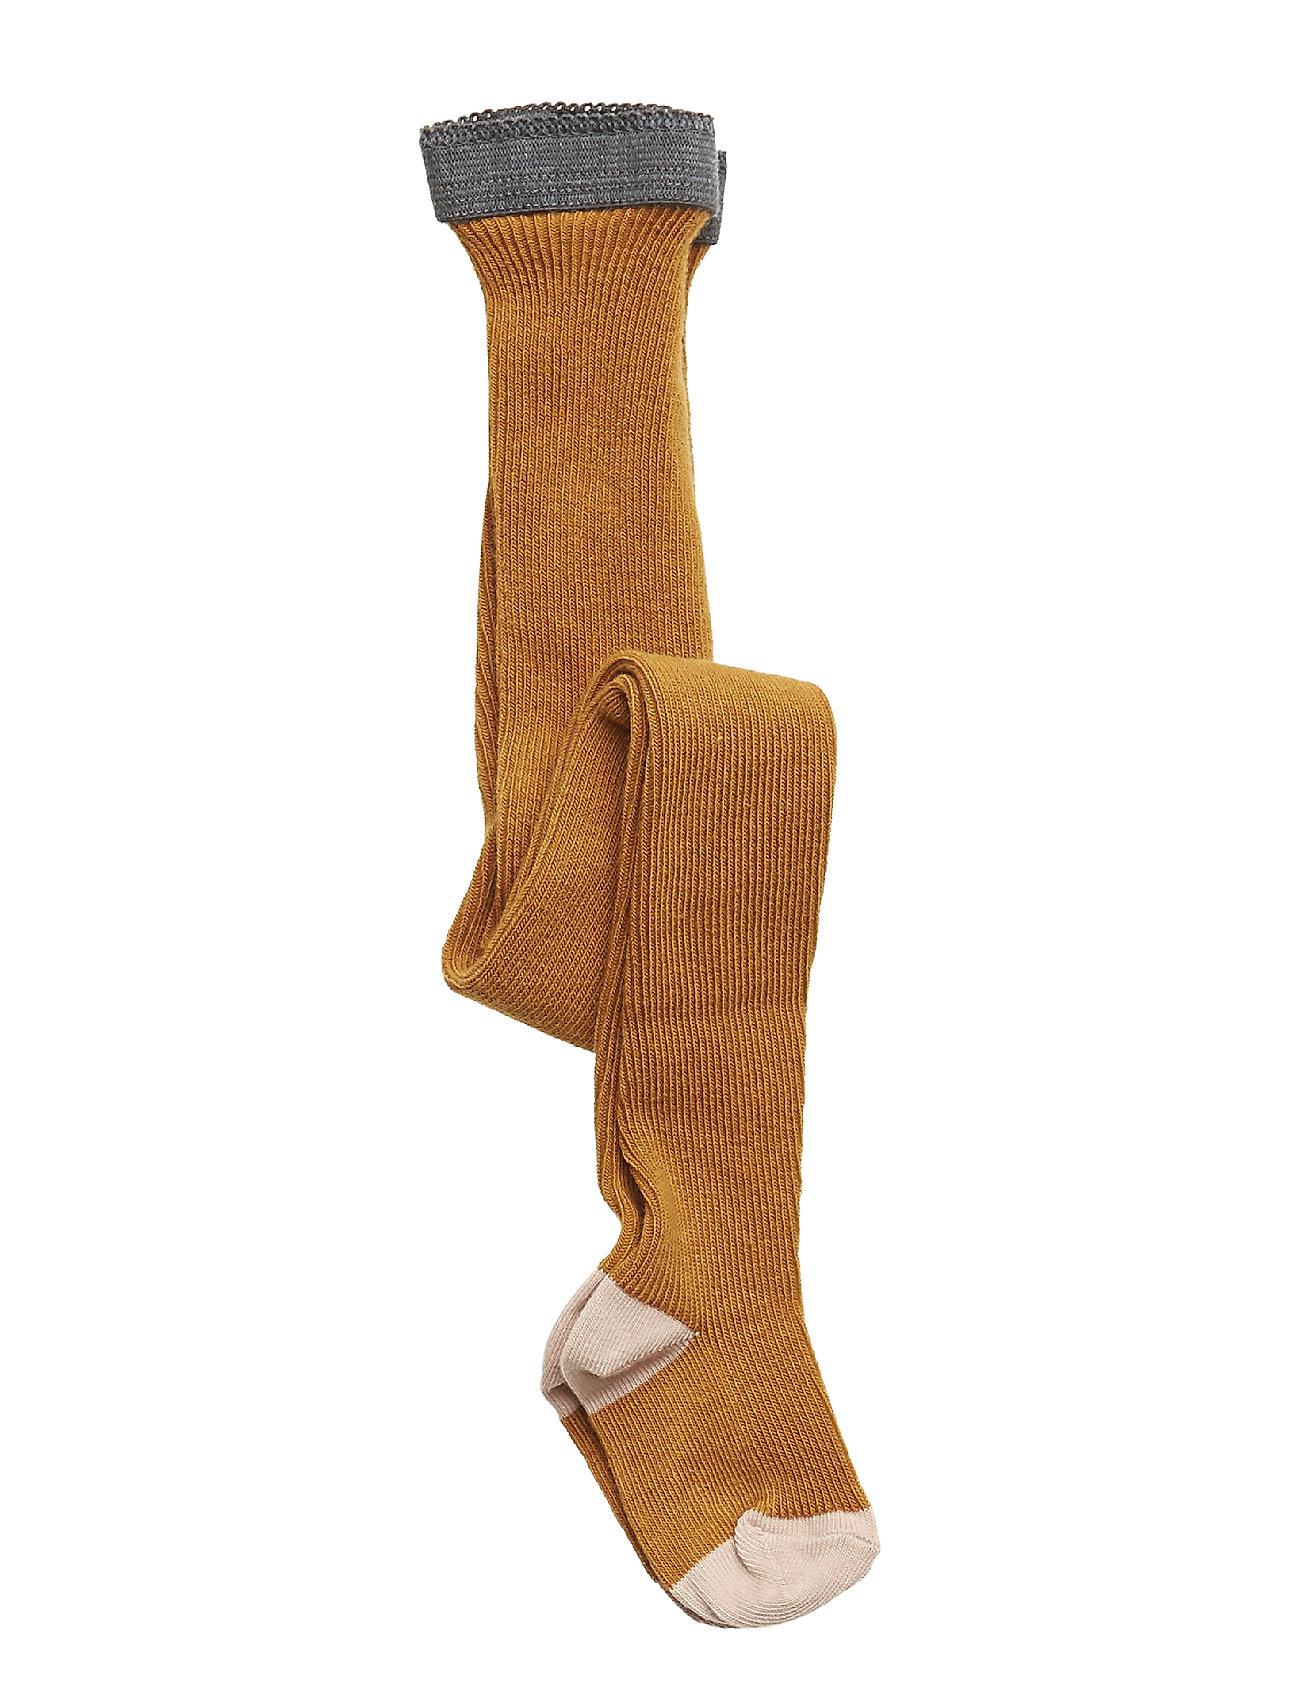 Liewood Linea stockings - MUSTARD